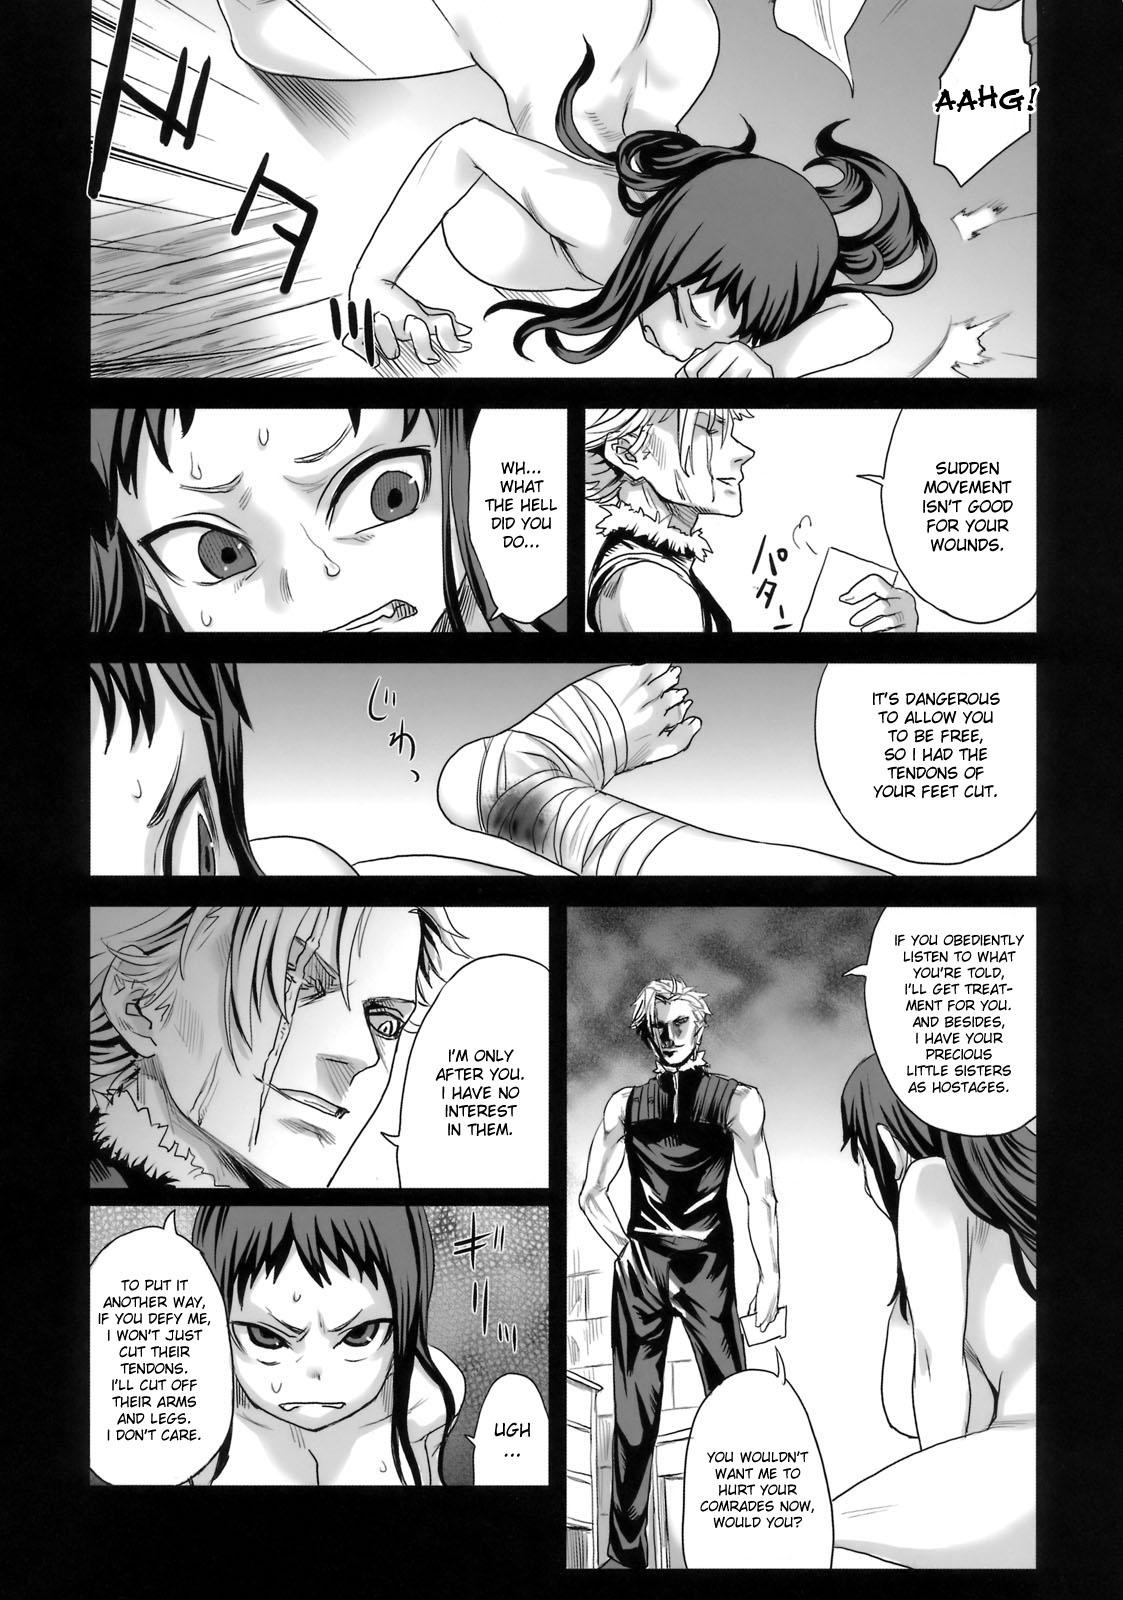 (C76) [Fatalpulse (Asanagi)] Victim Girls 7 - Jaku Niku Kyoushoku Dog-eat-Bitch (Fantasy Earth Zero) [English] [desudesu] 9